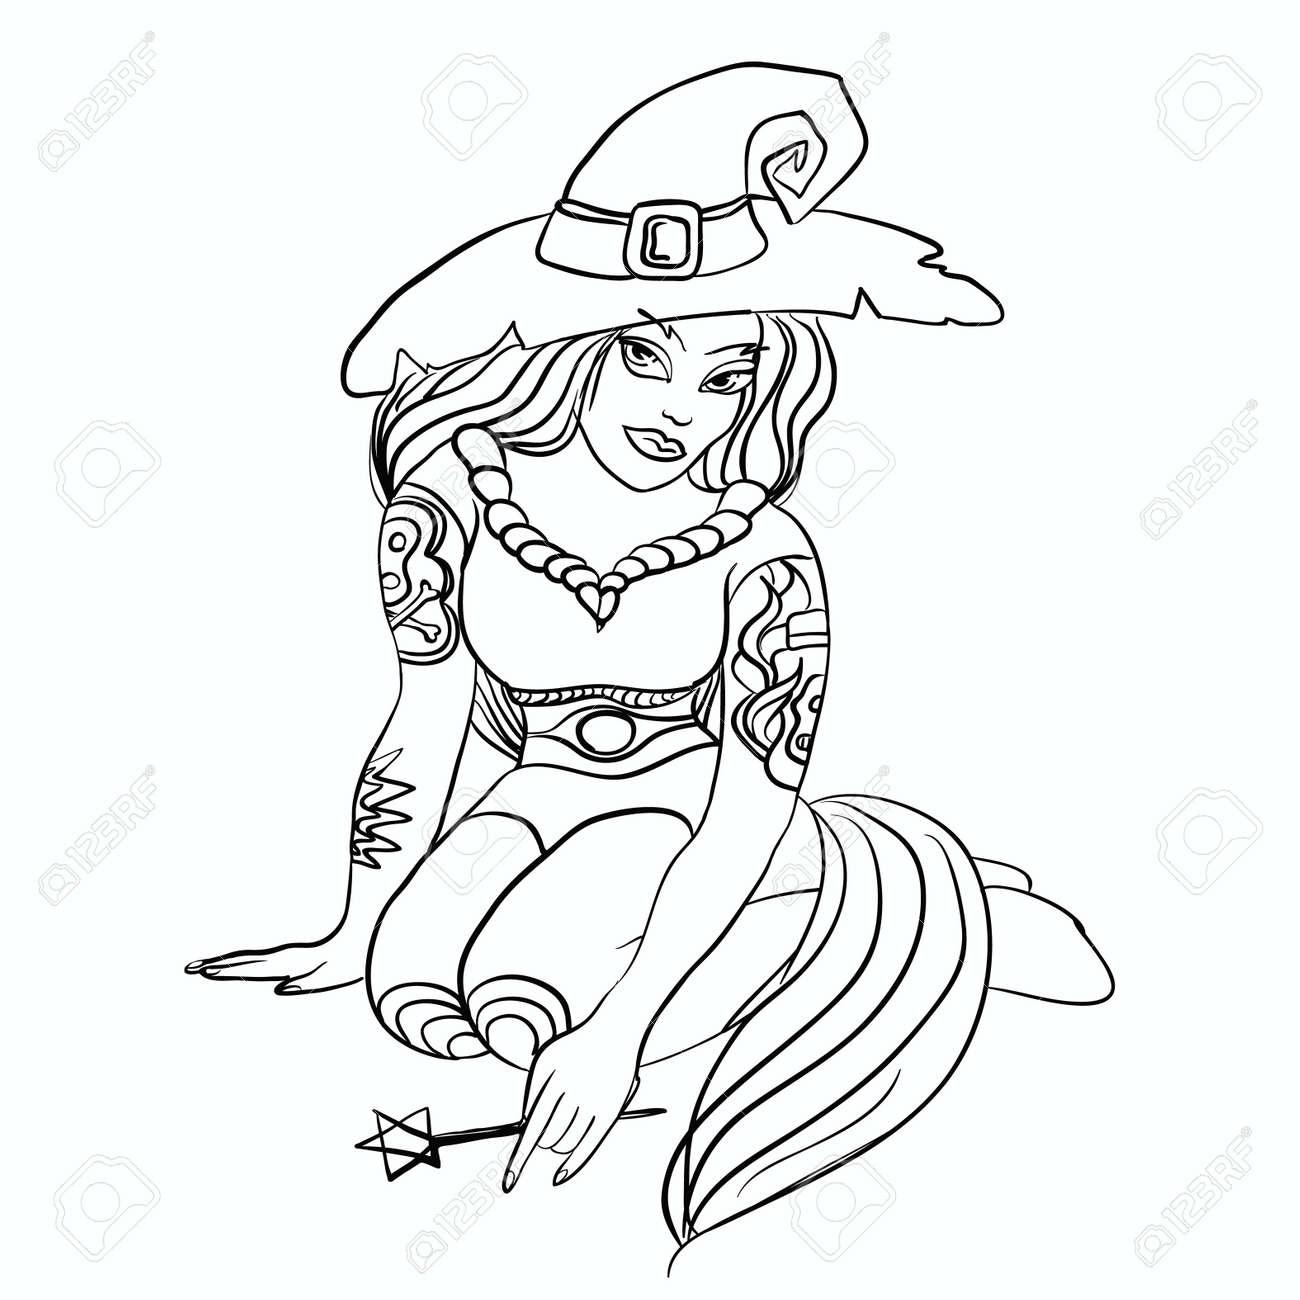 Bruja Silueta Línea Fina Con Tatuajes.Halloween Chica En Sombrero ...